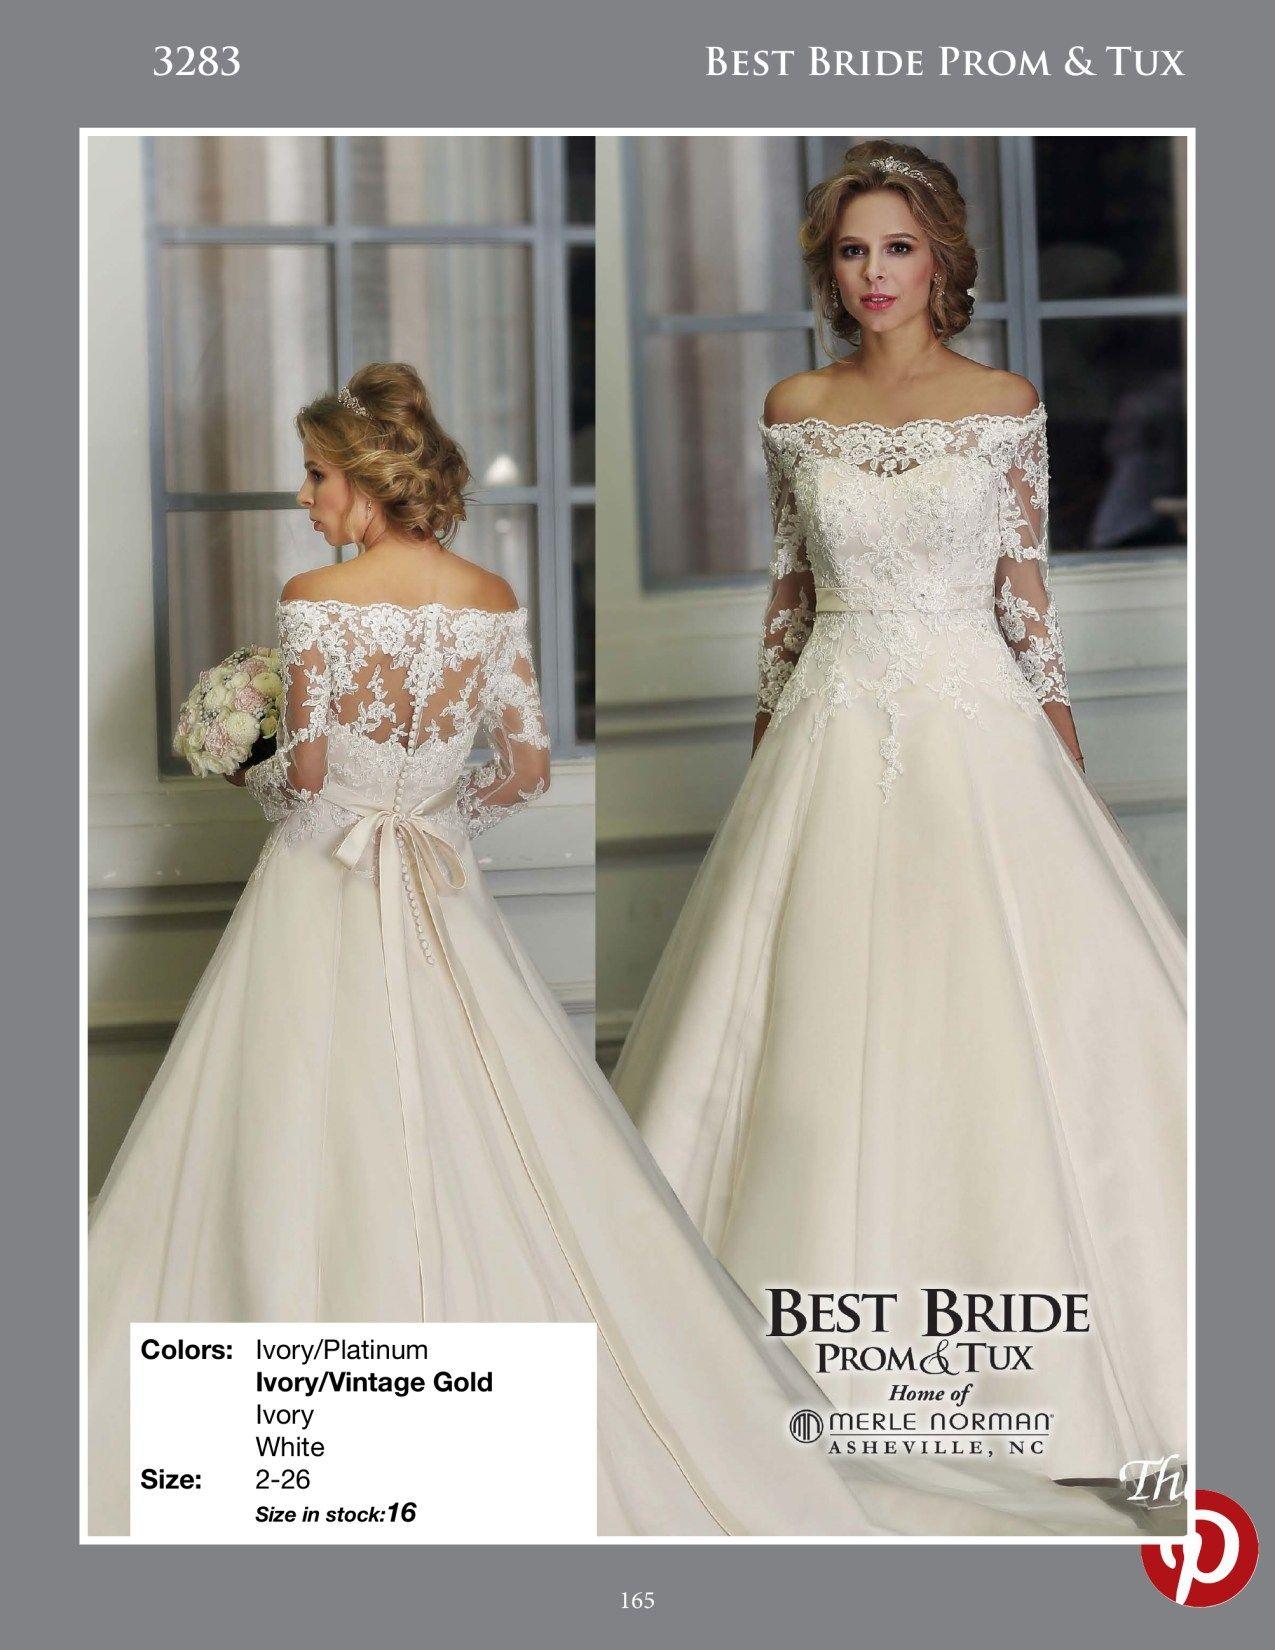 Platinum edition wedding dresses  Best Bride Prom and Tux   OUR WEDDING  Pinterest  Prom tux